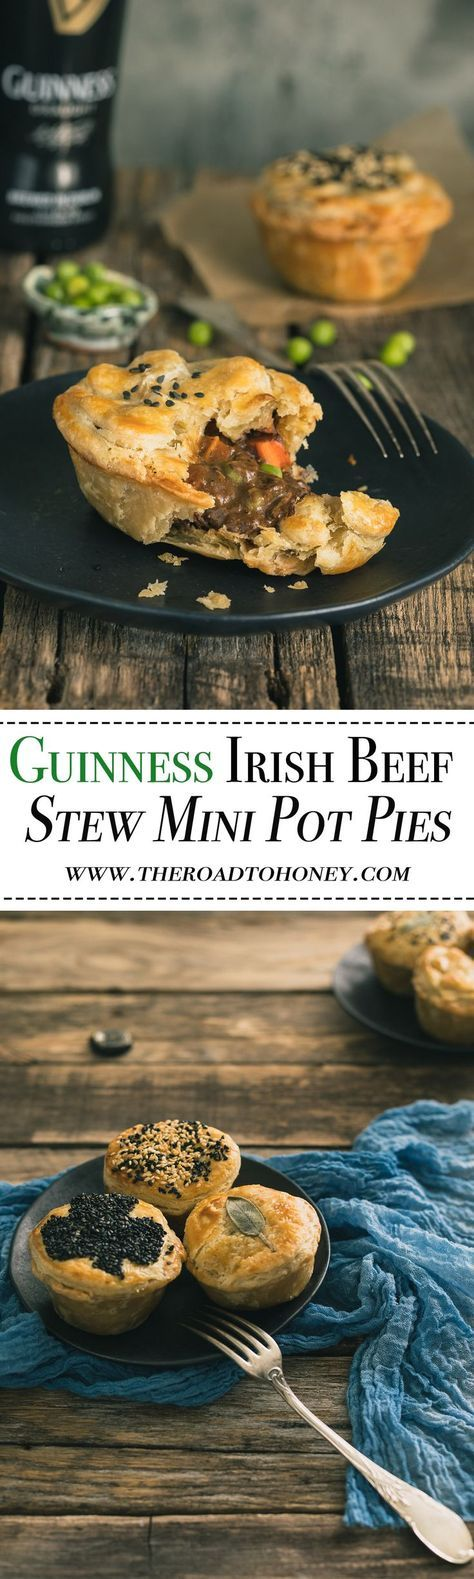 Guinness Irish Beef Stew Mini Pot Pies | Recipe | Irish ...